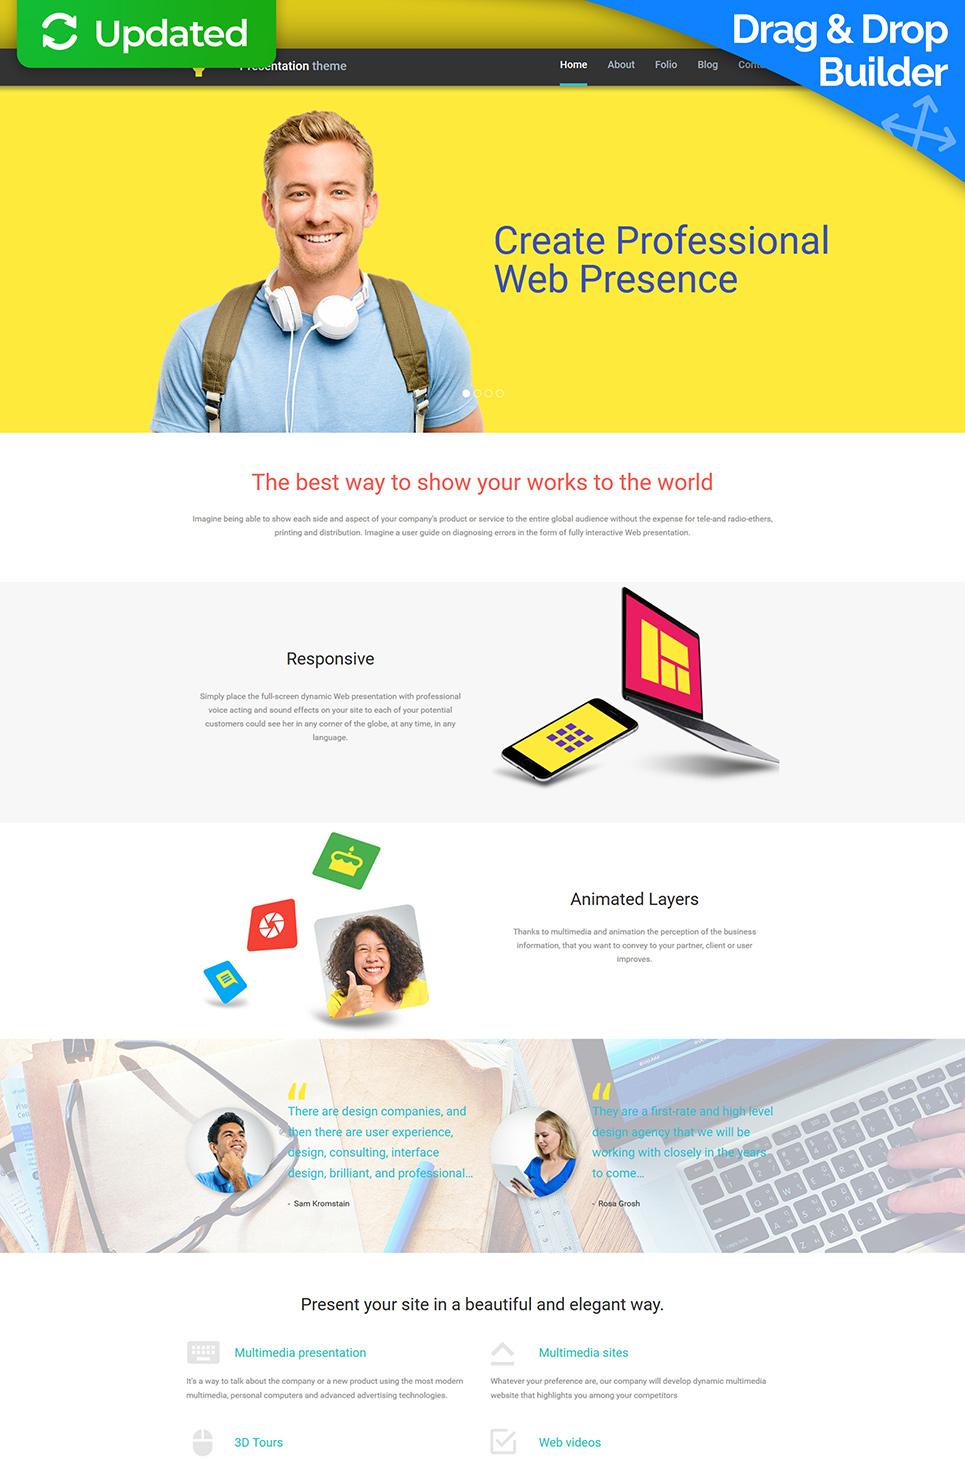 Web-master